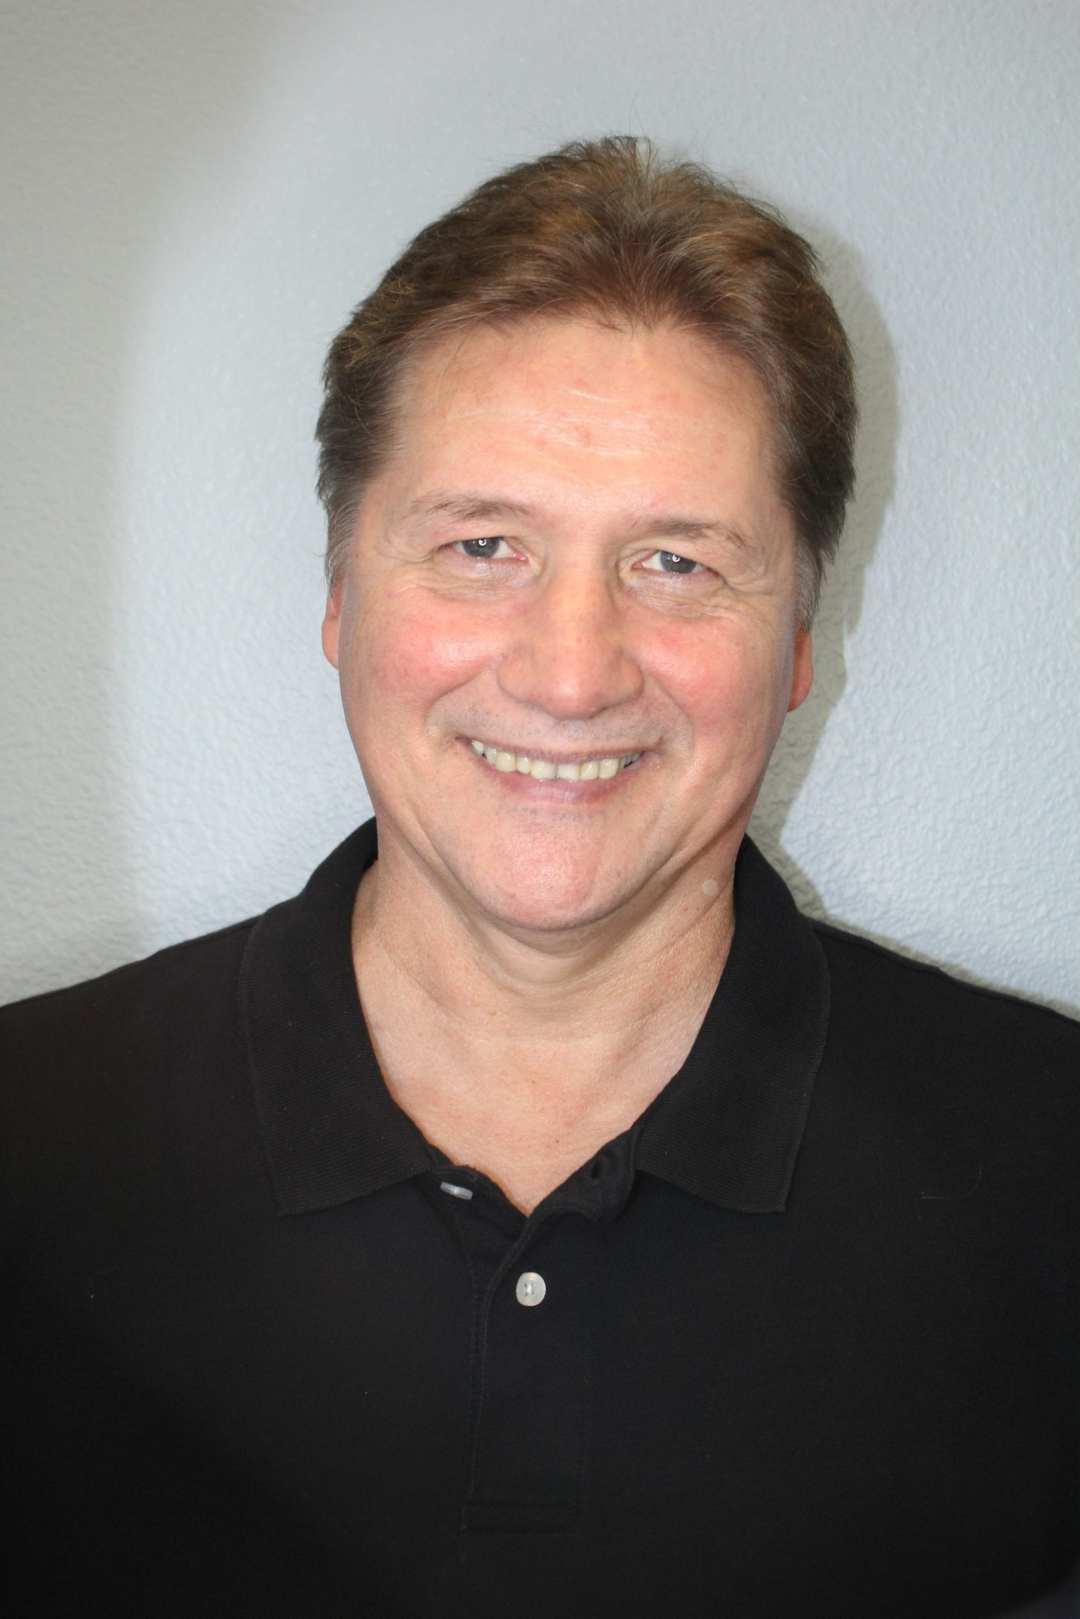 Peter Stahl